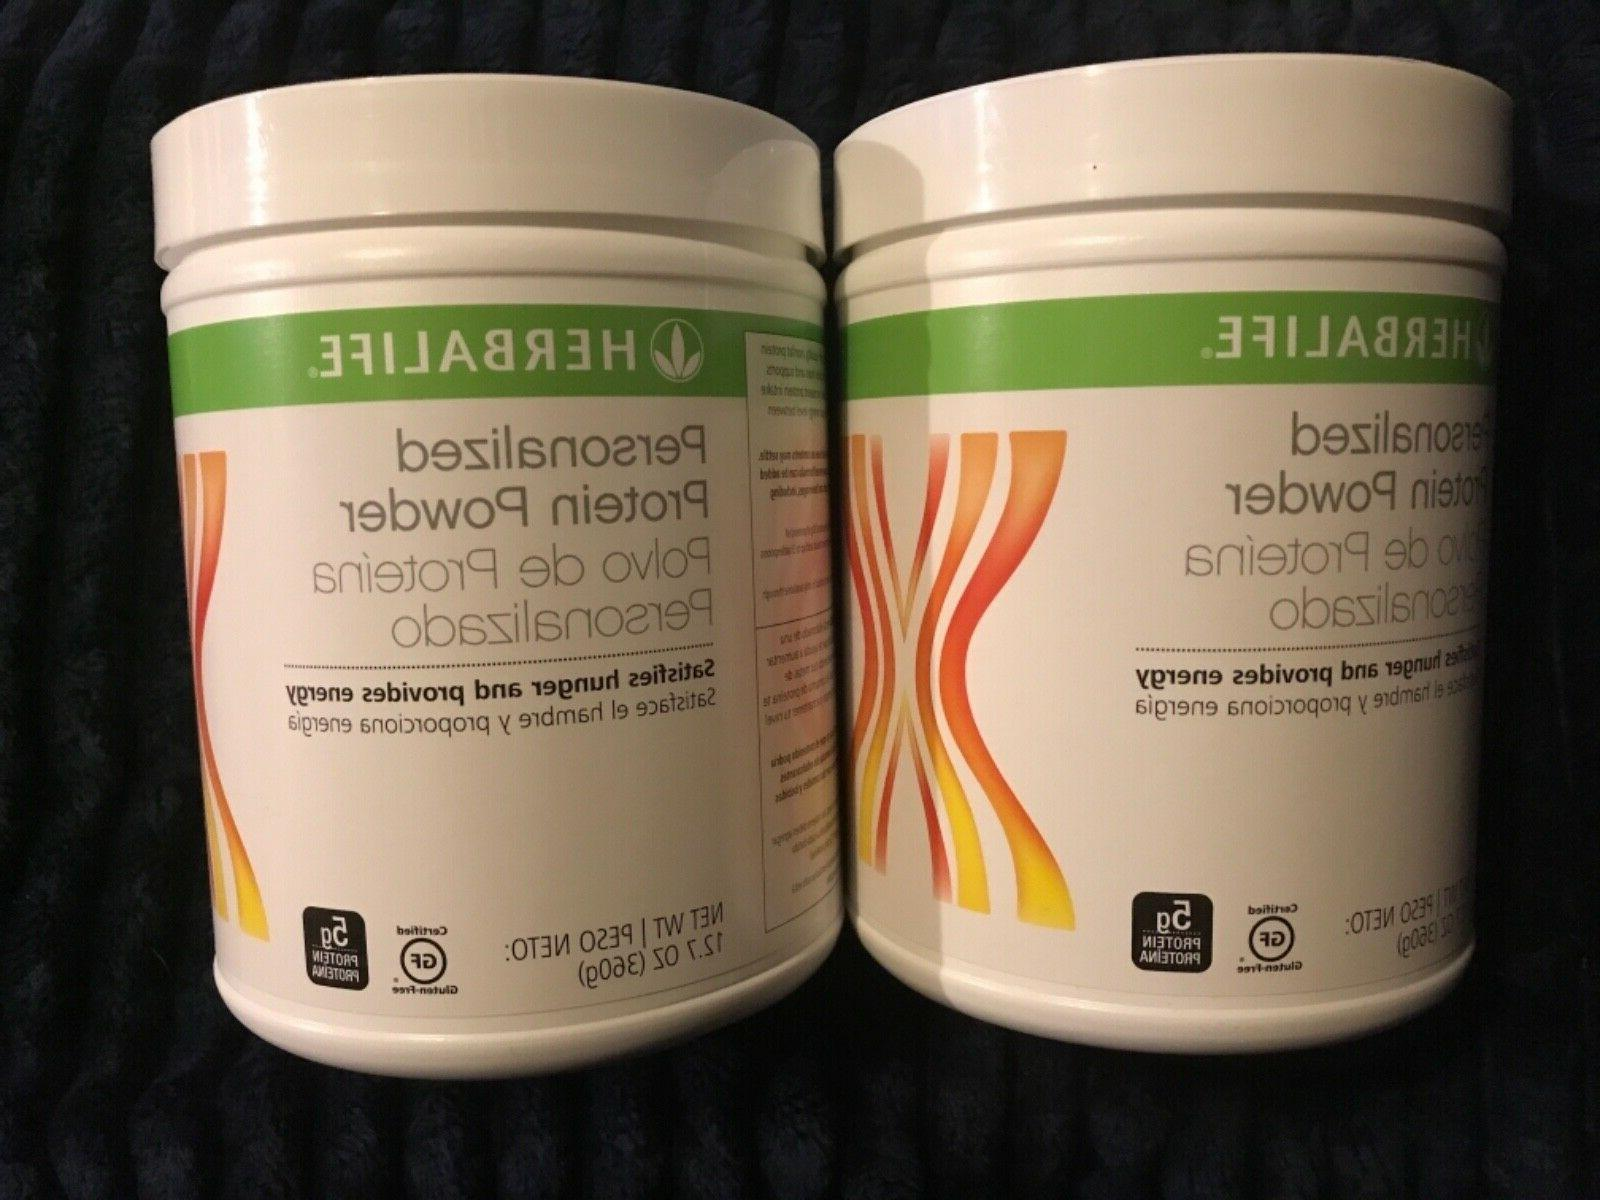 2 new personalized protein powder 12 7